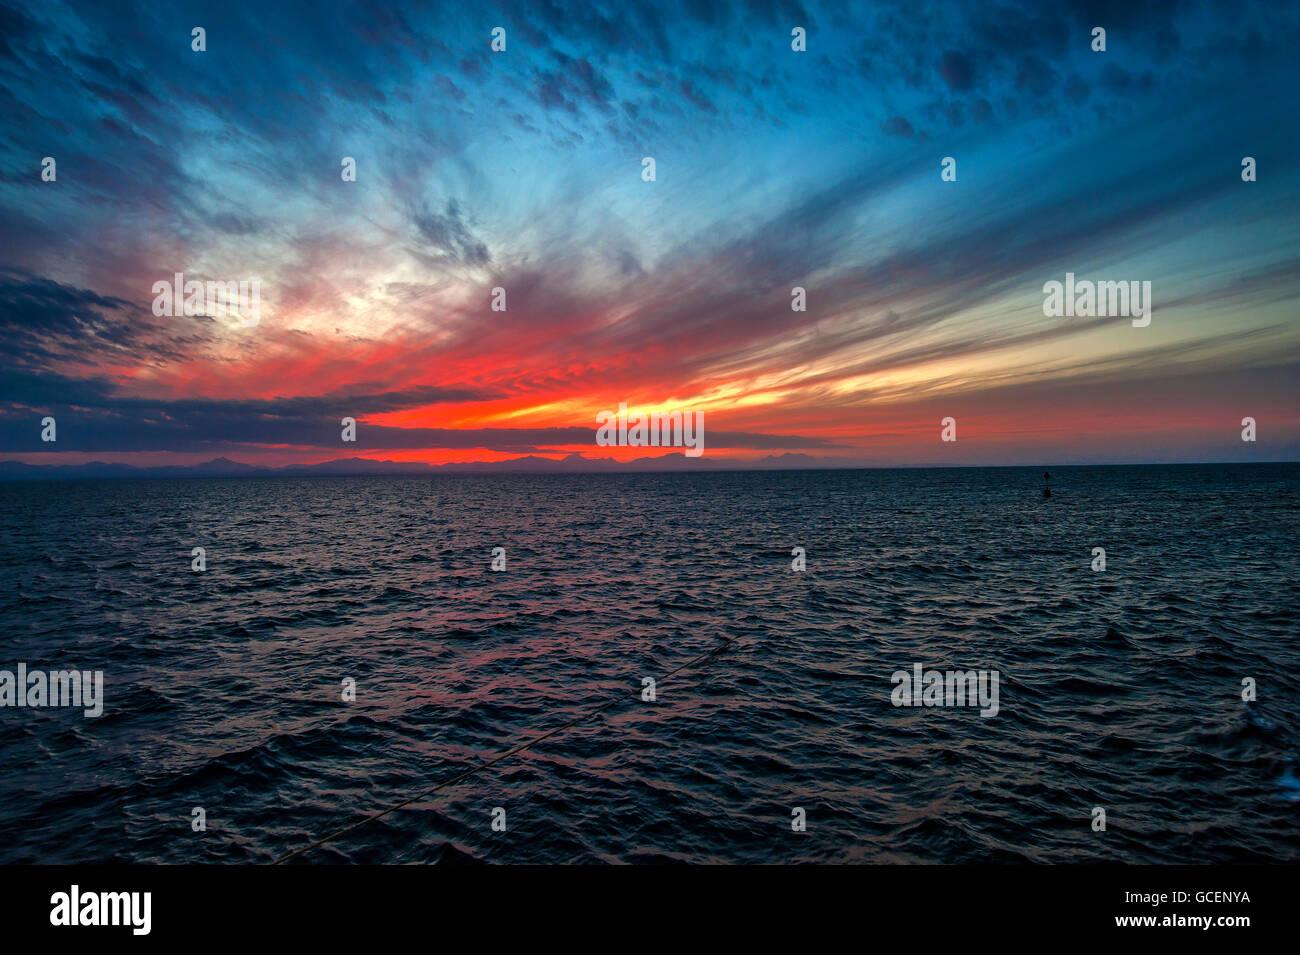 Sunset, ripples in ocean, Red Sea, Egypt - Stock Image